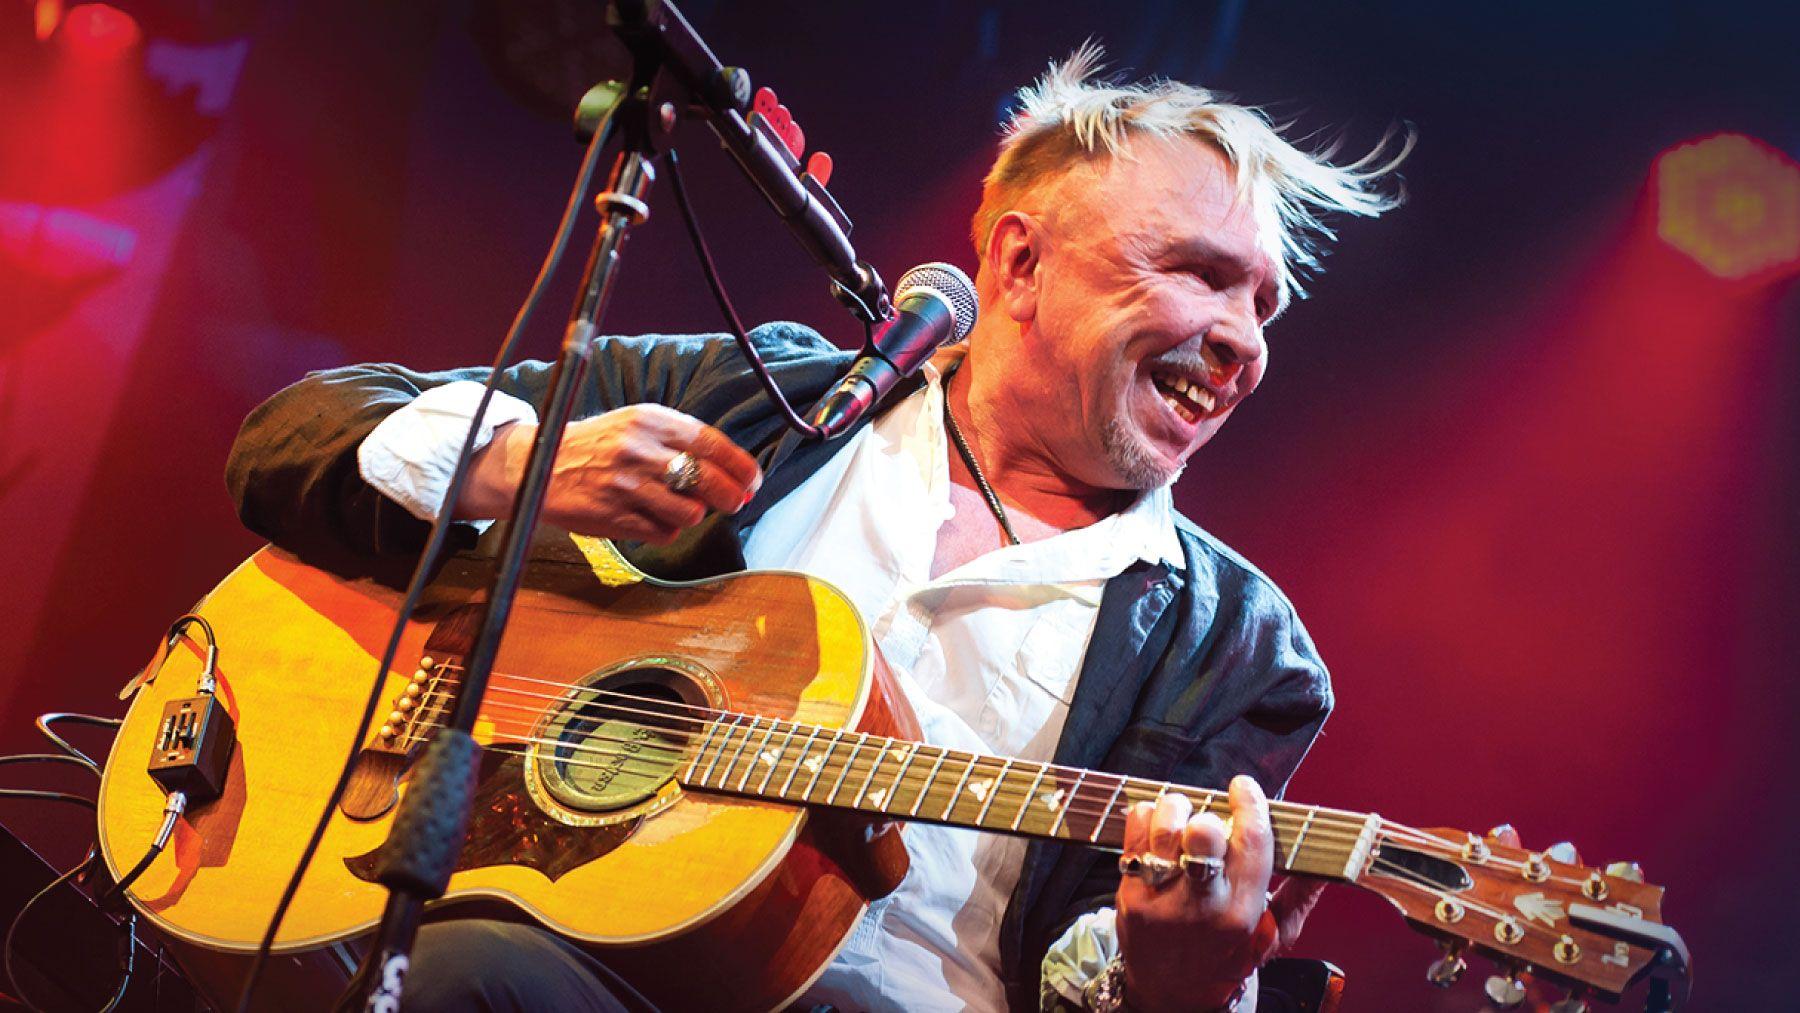 Гарик Сукачев анонсировал онлайн-концерт